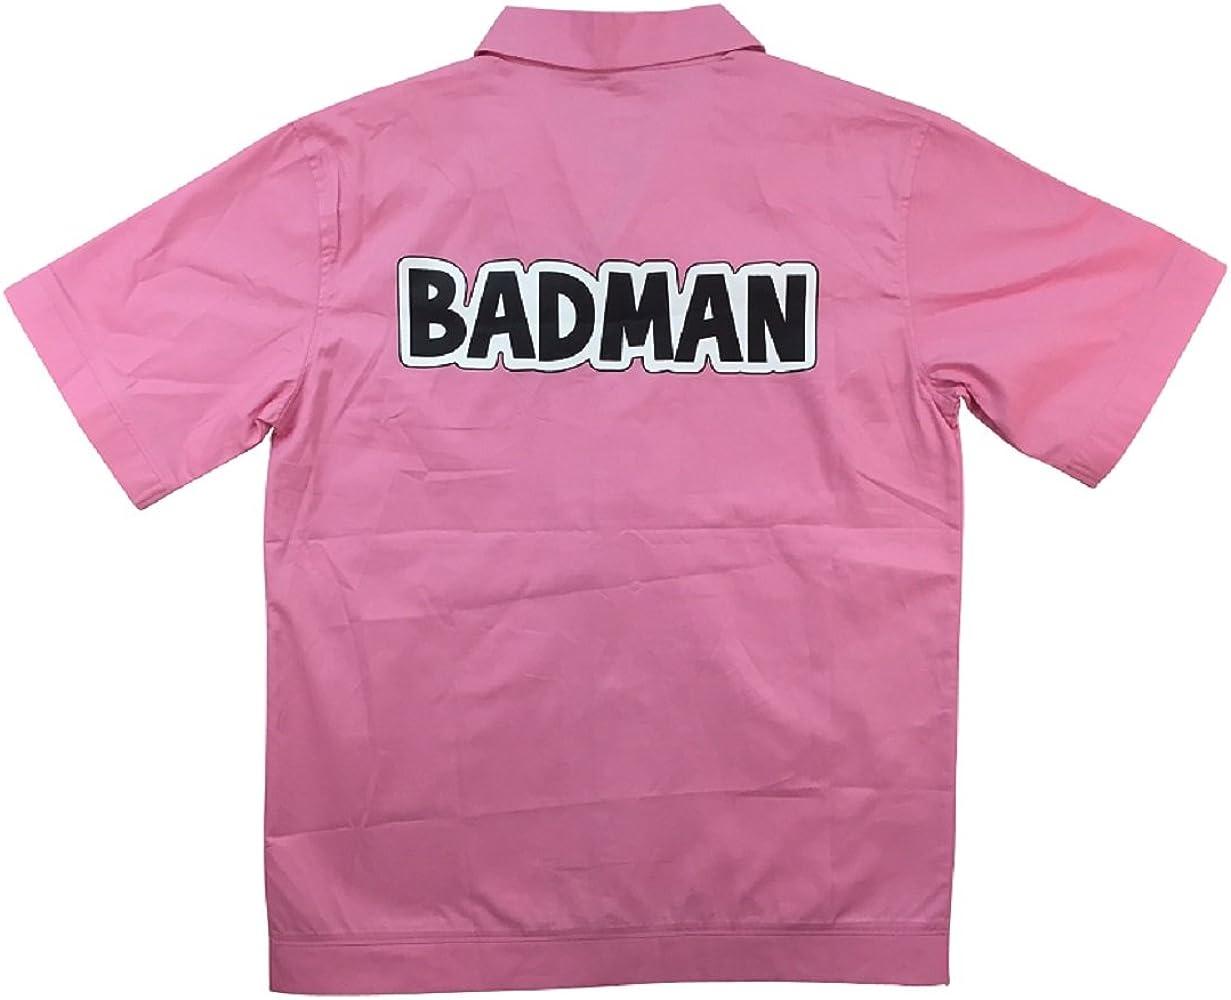 Ripple Junction Dragon Ball Z Vegeta Badman Disfraz Camiseta ...